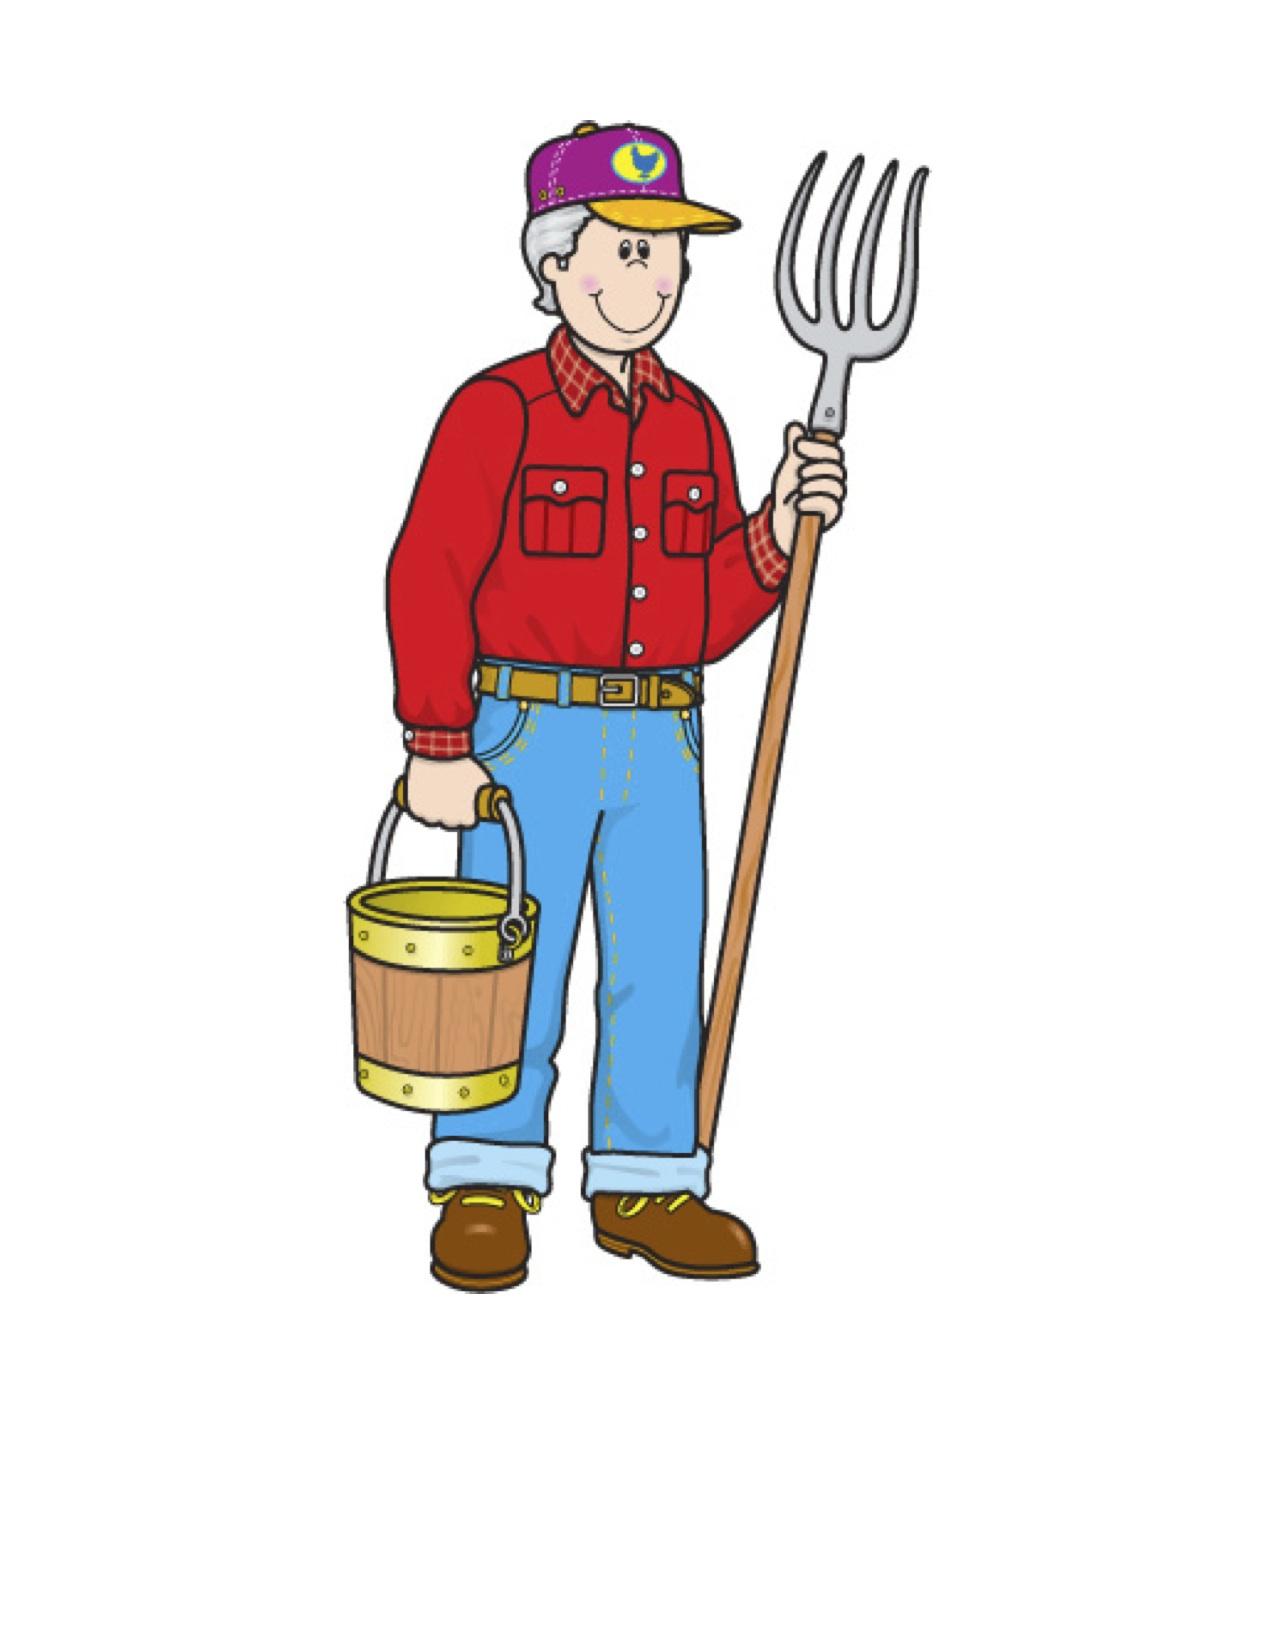 Free farmer cliparts download. Farmers clipart man